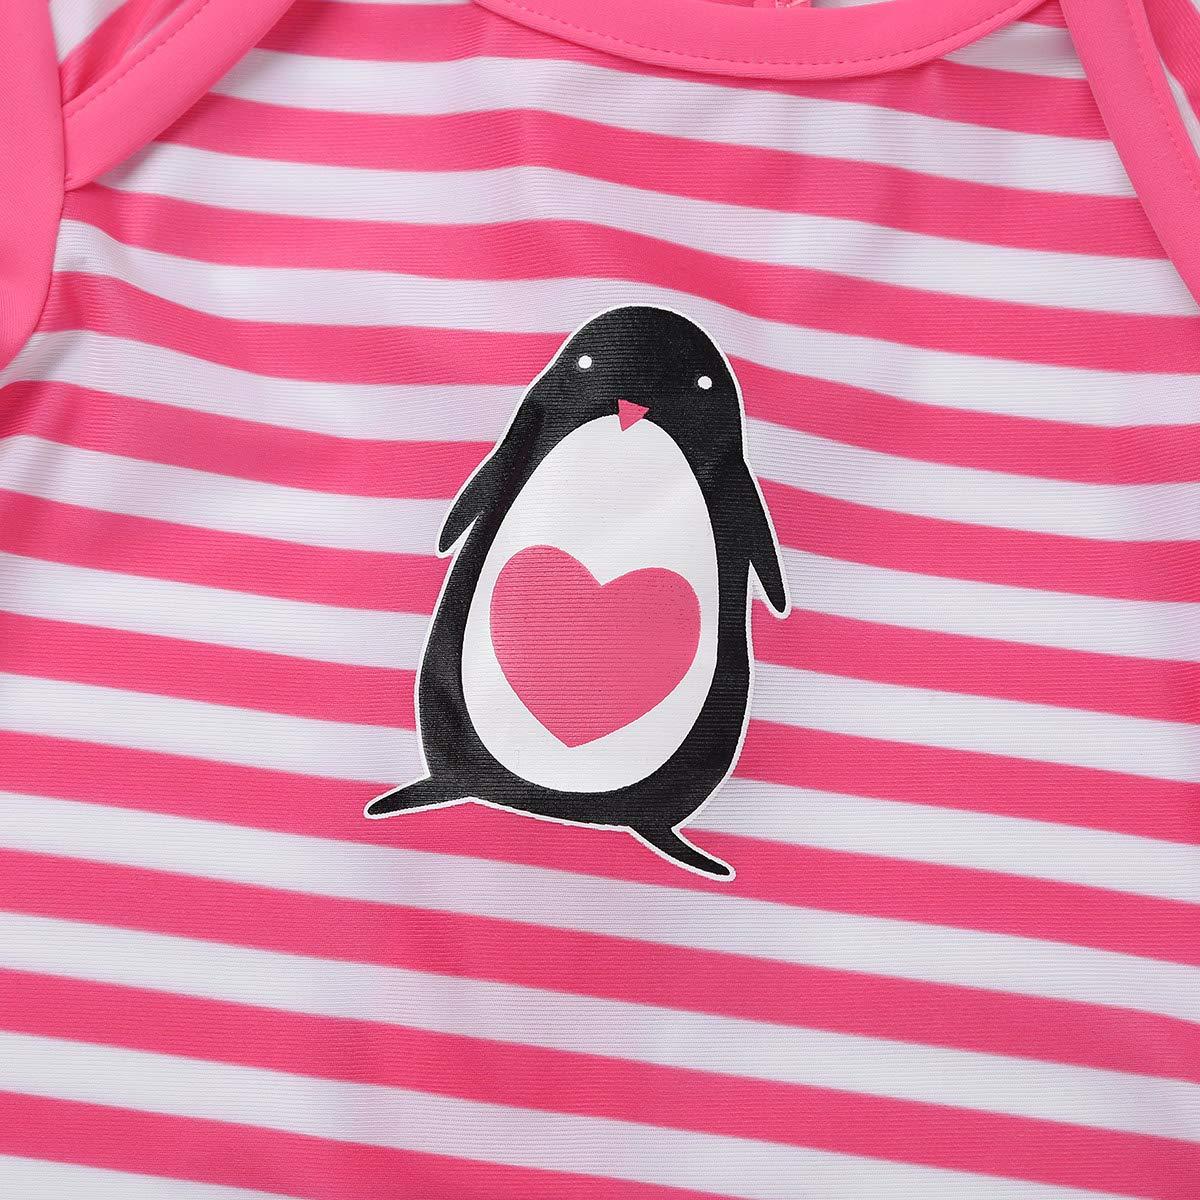 Agoky Infant Baby Boys Girls One-Piece Stripe Swimsuit Swimwear Rash Guard Bathing Suit